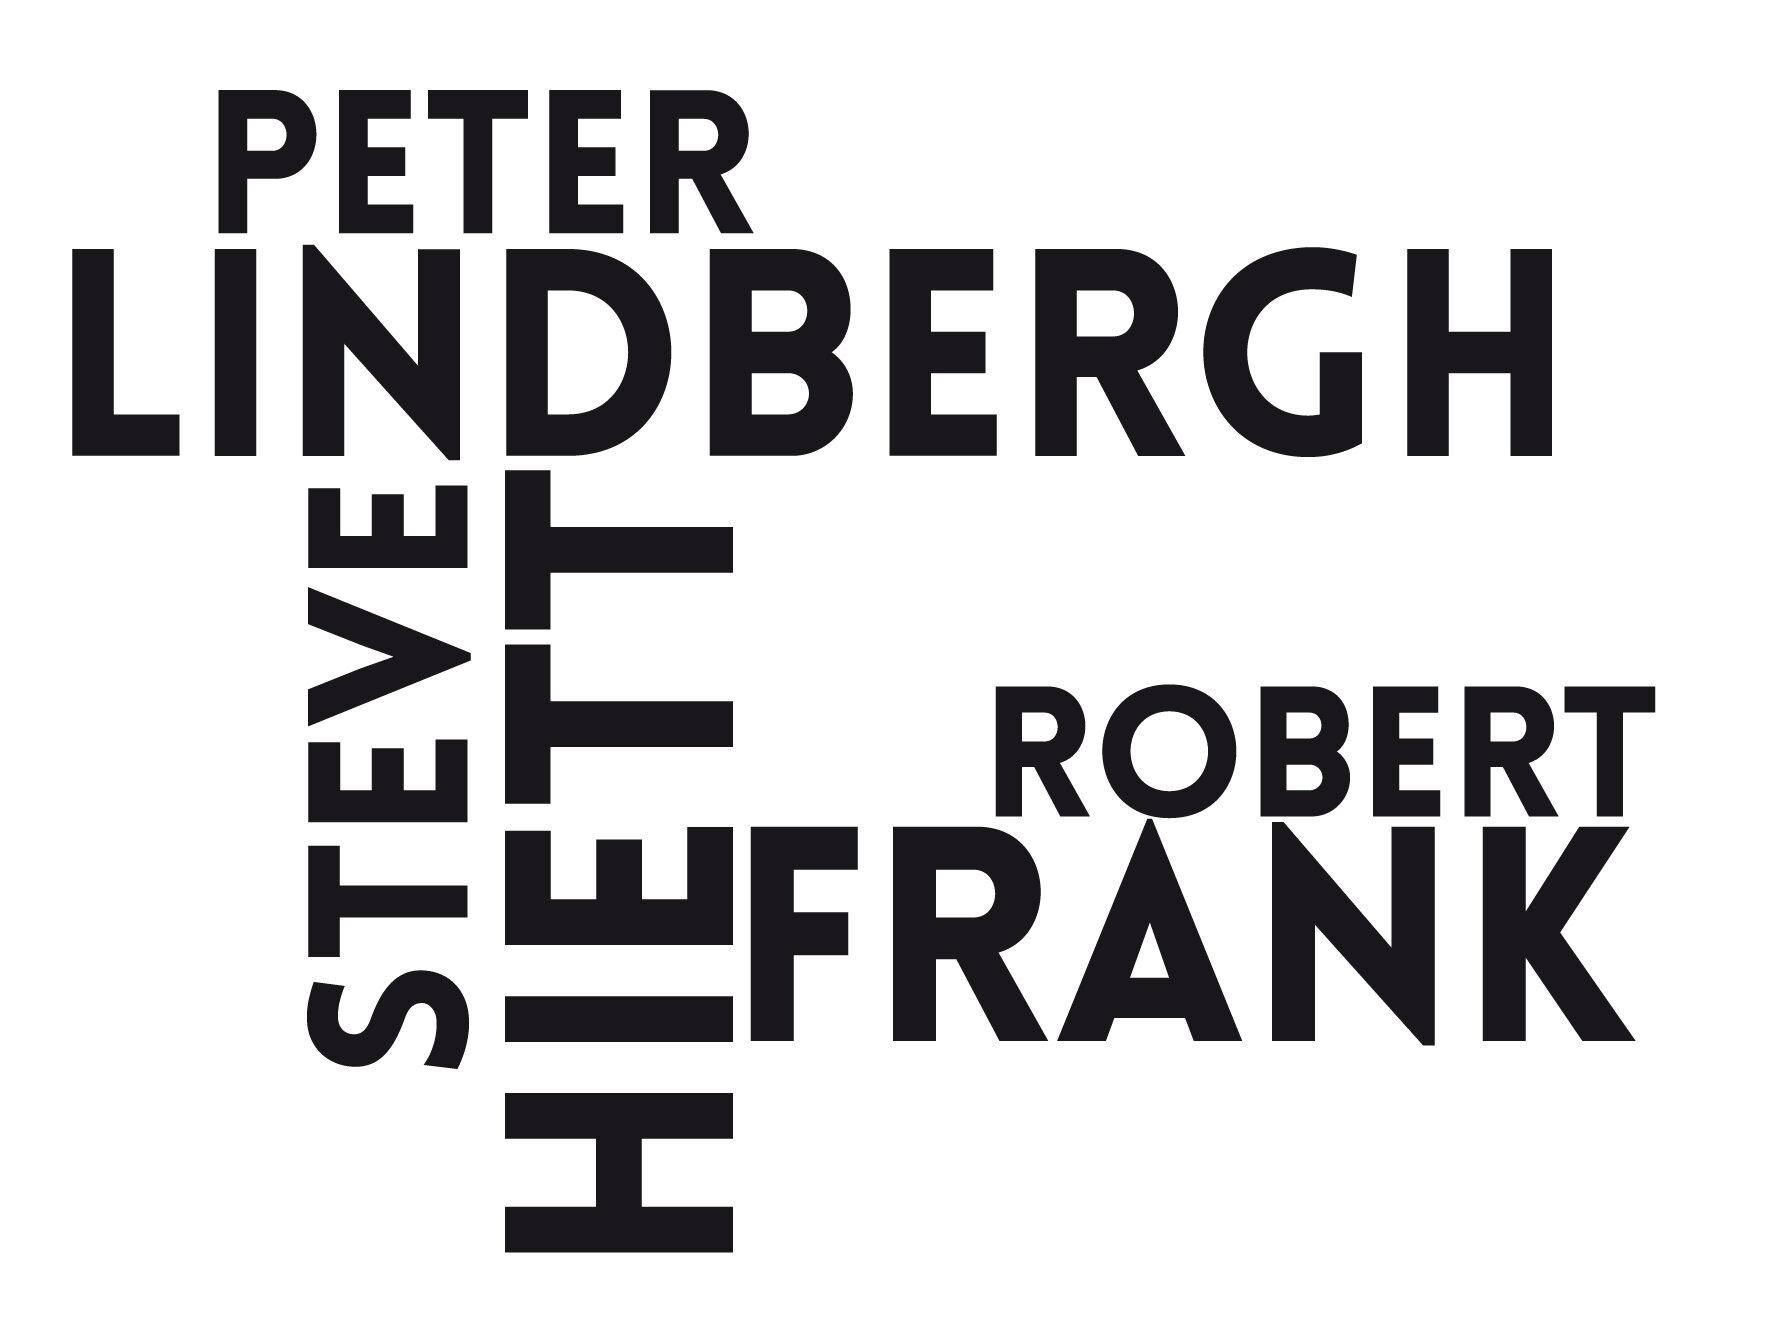 1nstant-hommage-hiett-lindbergh-frank.jpg